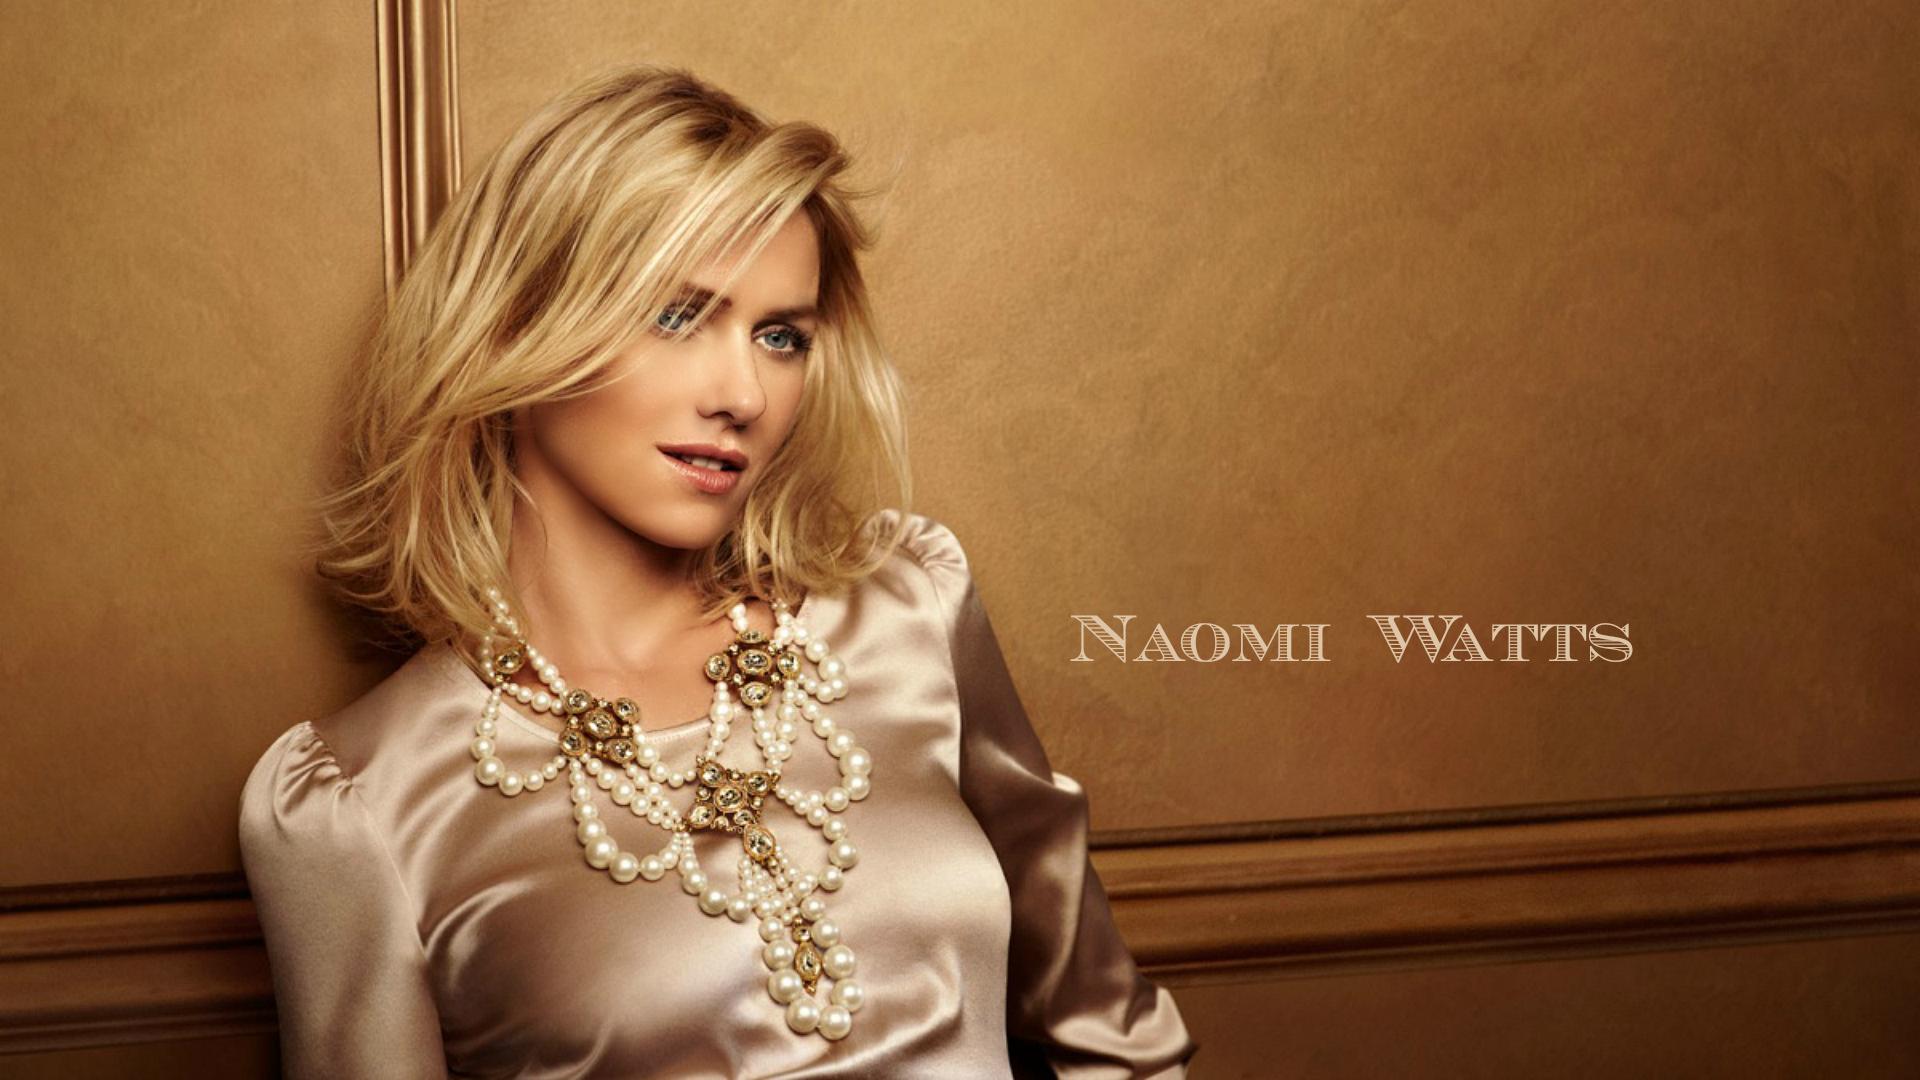 Naomi Watts Background Wallpapers WallpapersIn4knet 1920x1080